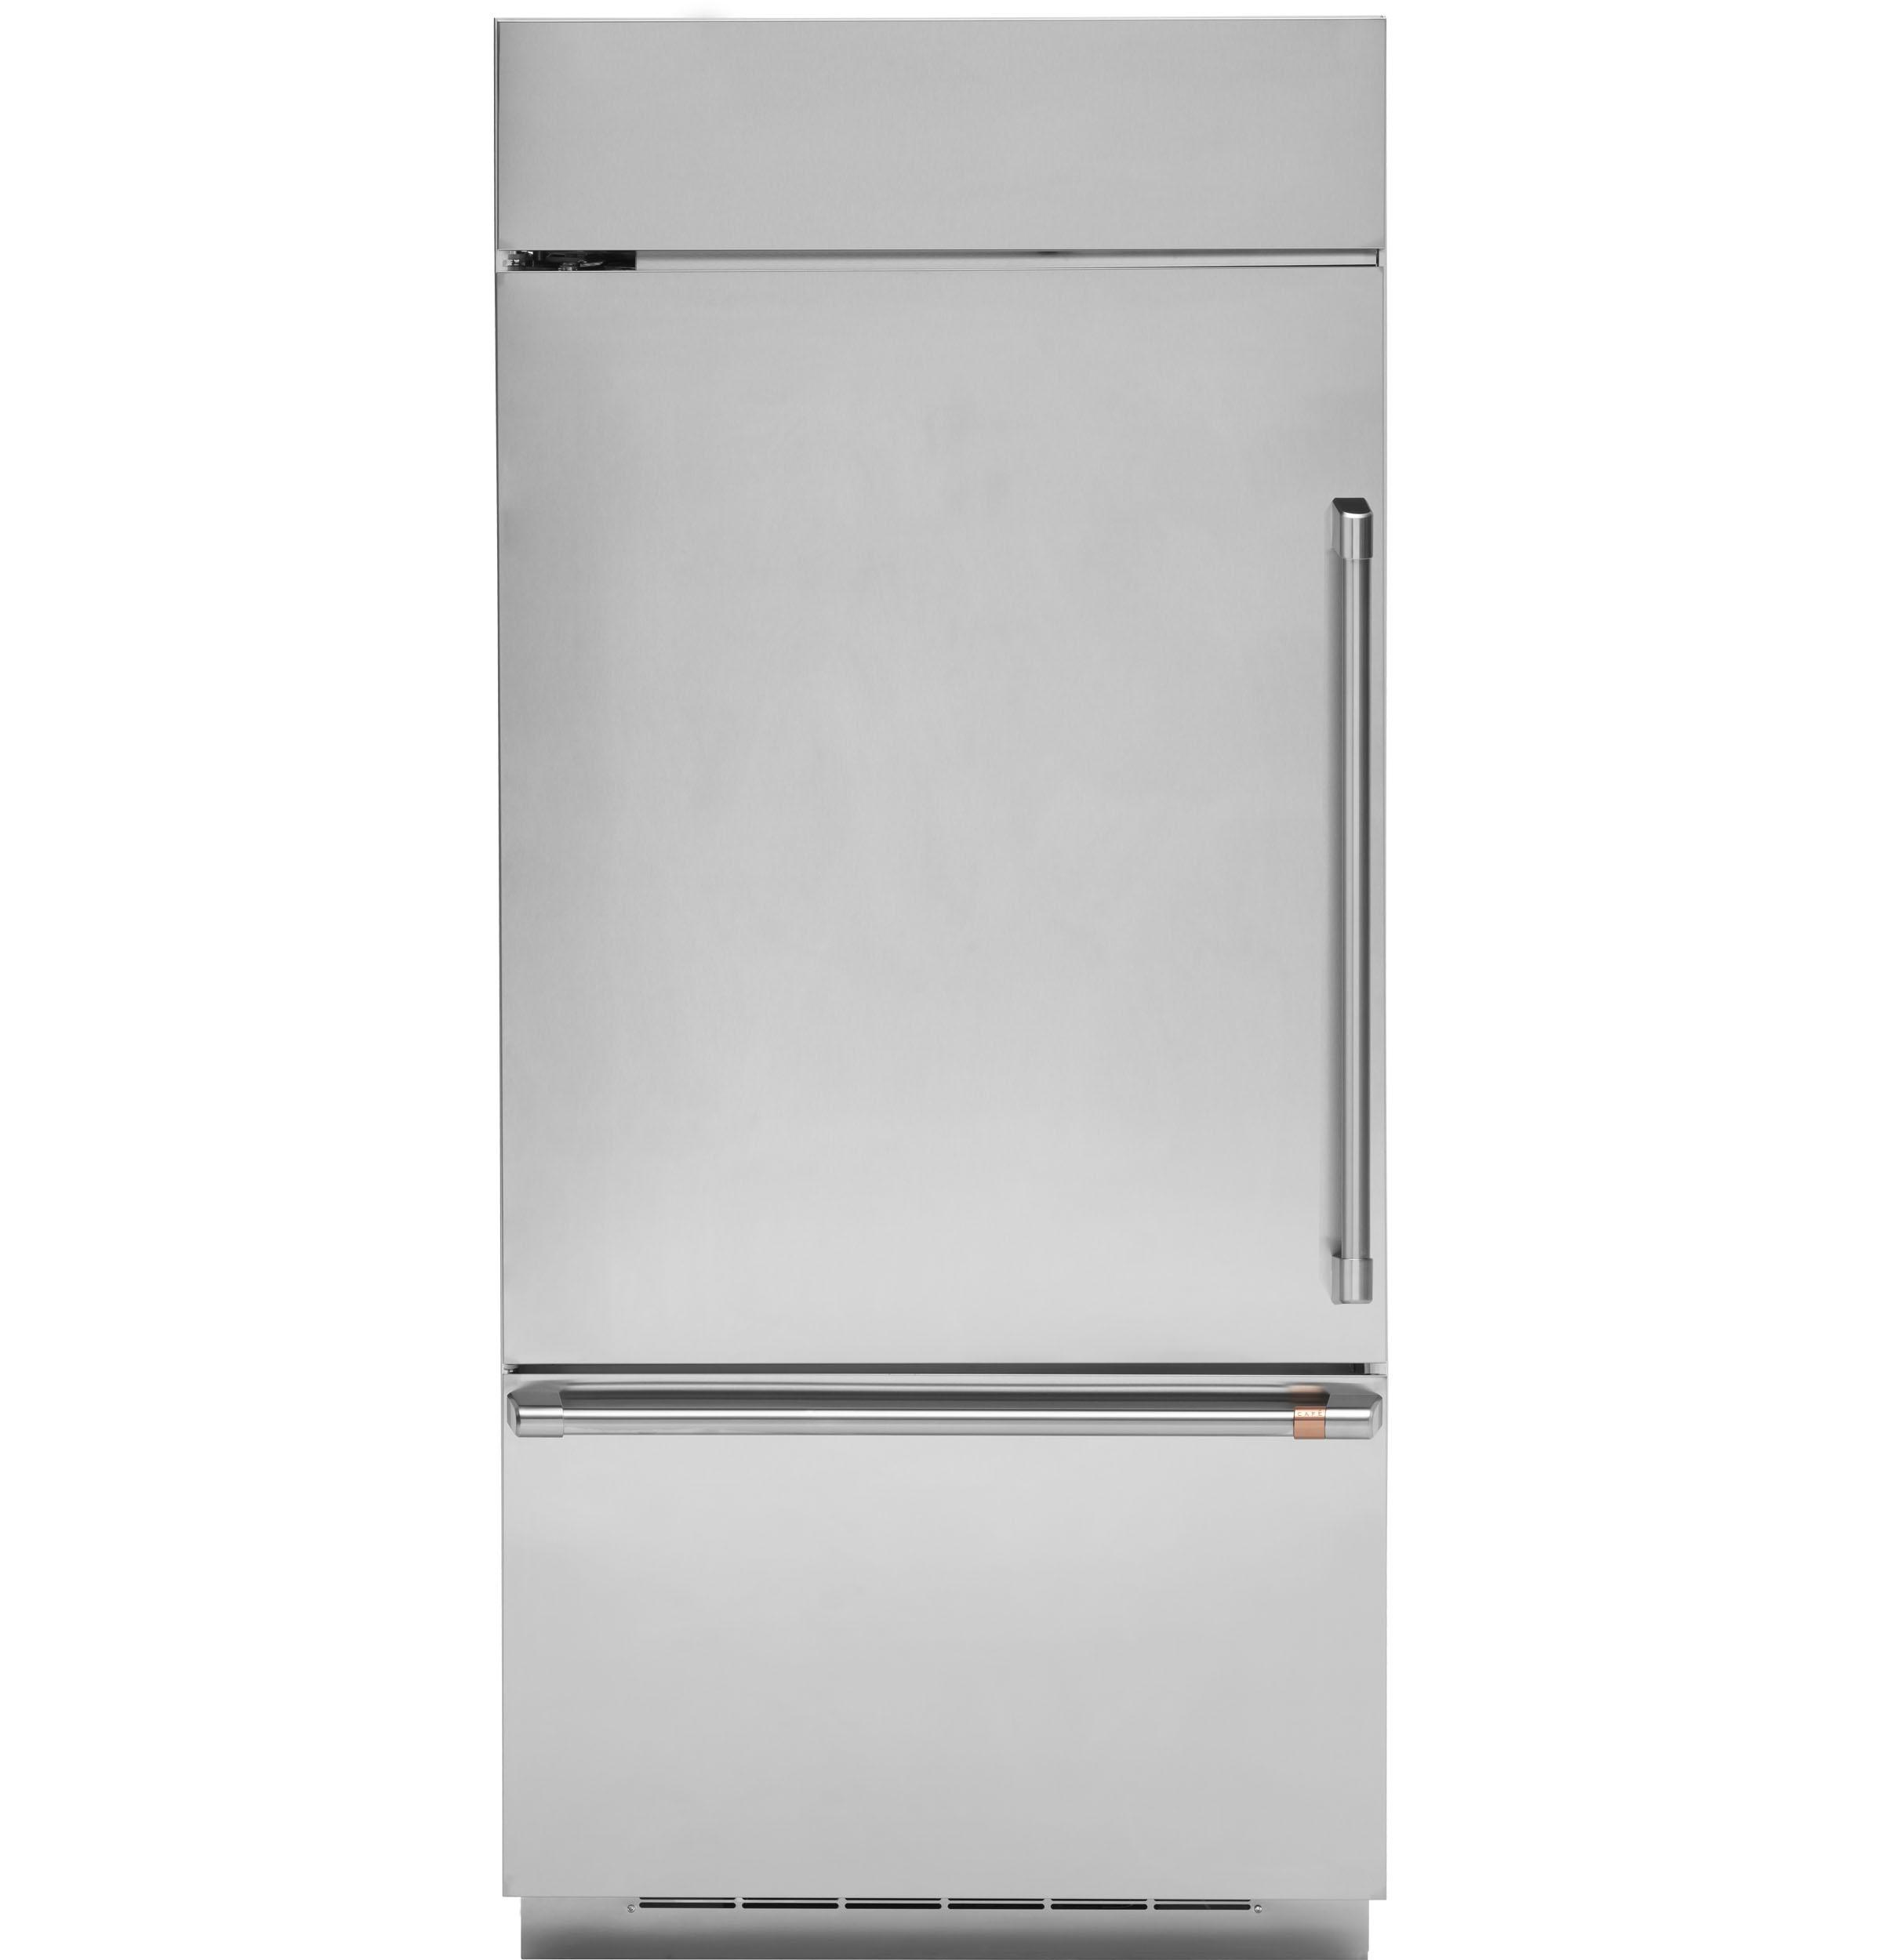 Model: CDB36LP2PS1   Cafe Café™ 21.3 Cu. Ft. Built-In Bottom-Freezer Refrigerator